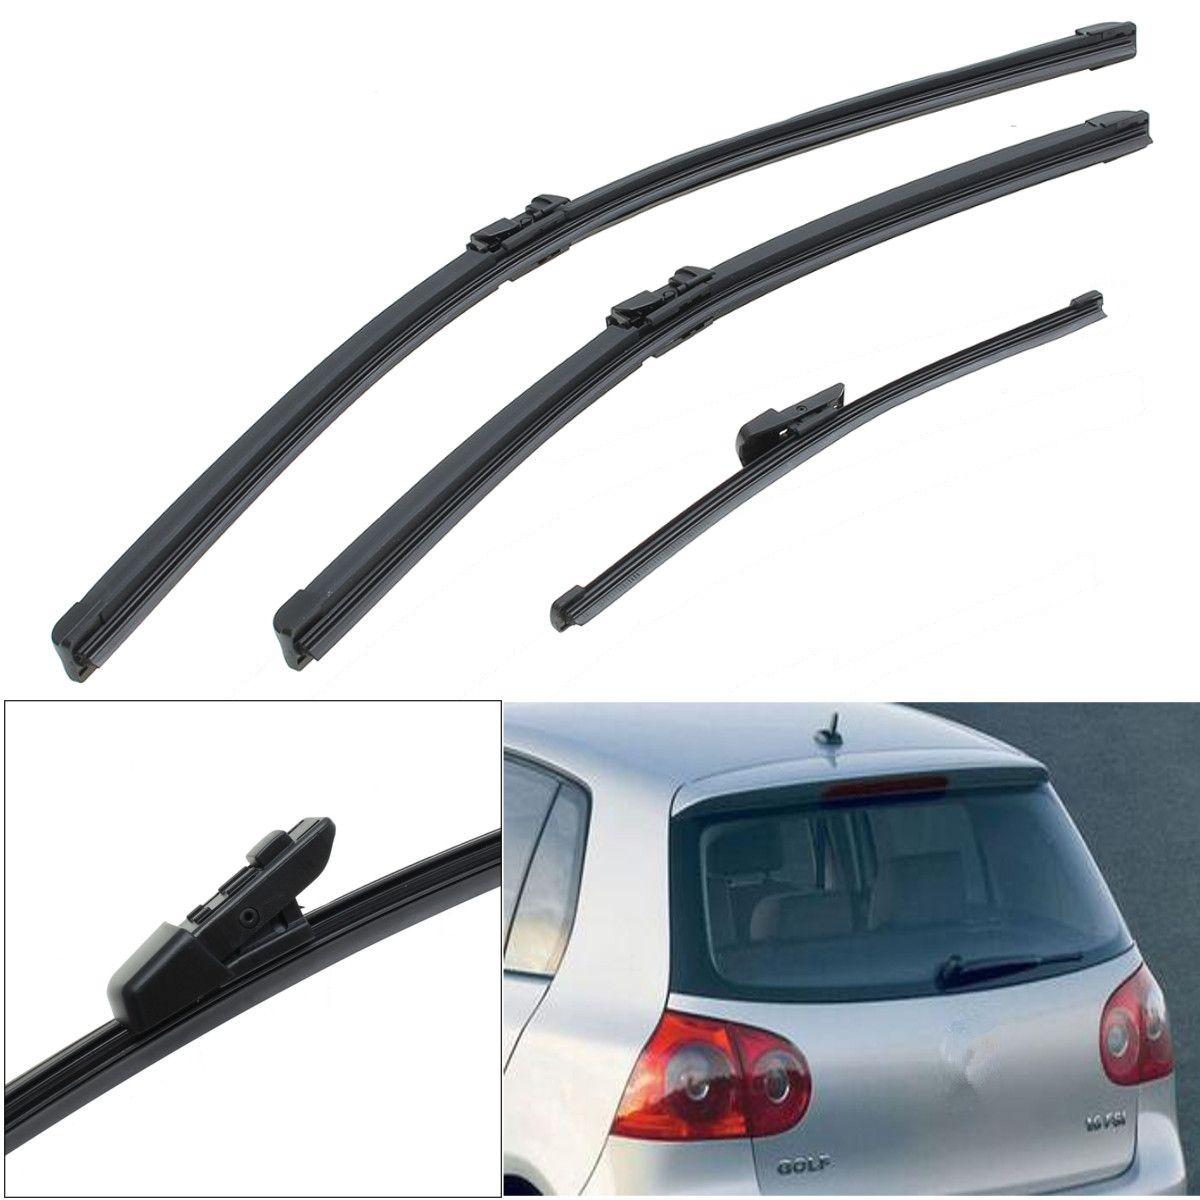 3Pcs/Set Front & Rear Window Windshield Wiper Blades For VW Golf Mk6 Hatchback 2008-2014